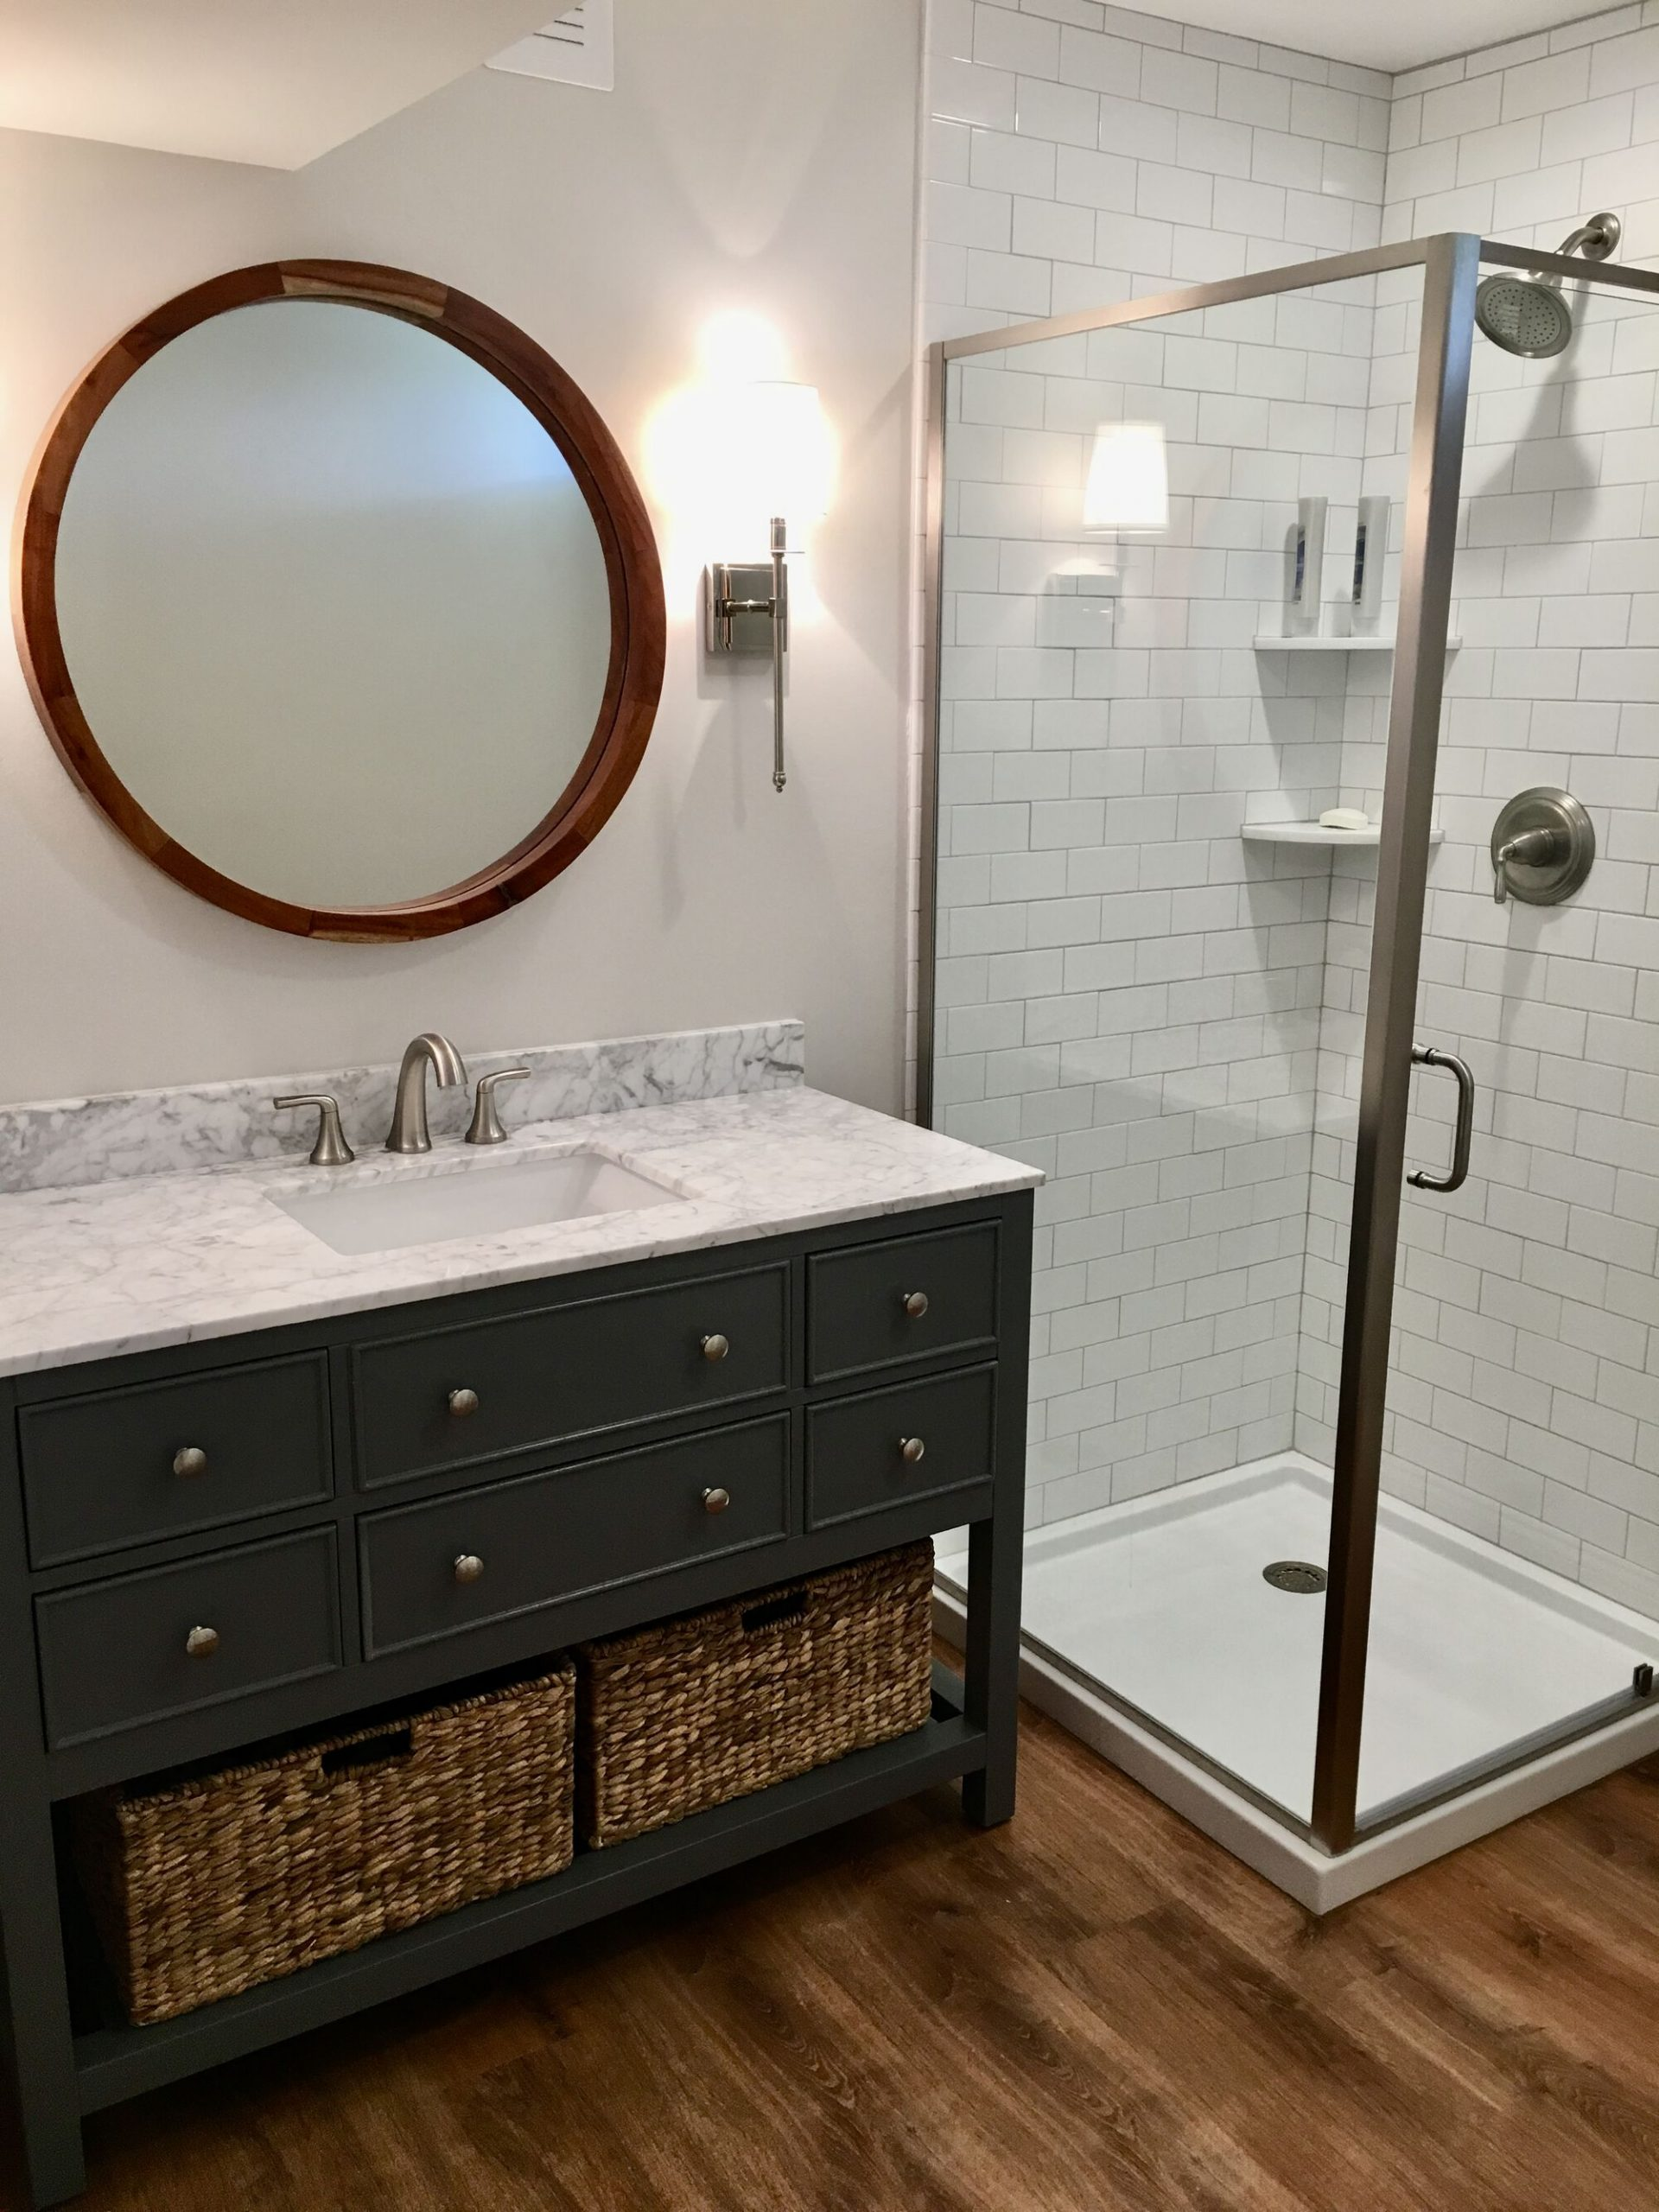 Basement Bath with Corner Shower, Porcelain Tile, Wood Vanity in Warren County NJ